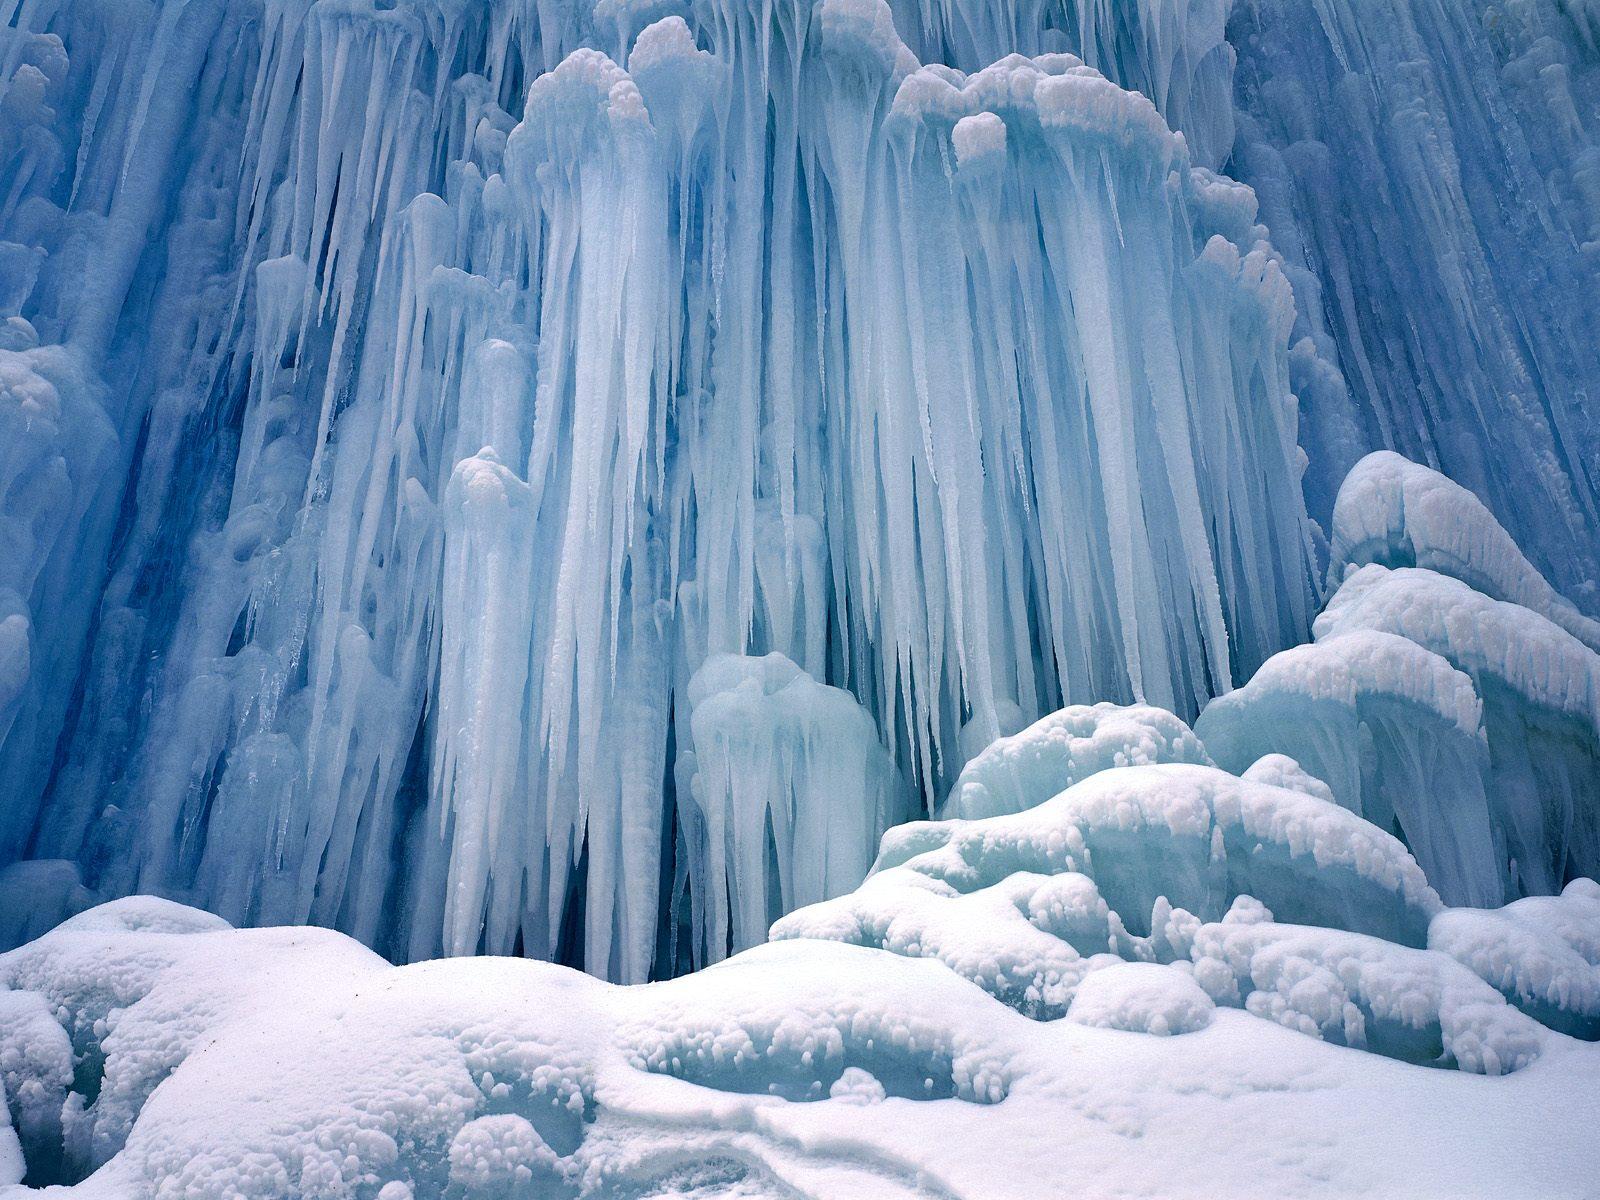 https://3.bp.blogspot.com/-pcnjTjv1ZT4/TbWduz3UjDI/AAAAAAAACdY/_-k9xhcaB6s/s1600/Ice_Castle_Waterfall_-_Yoho_National_Park%252C_British_Columbia.jpg